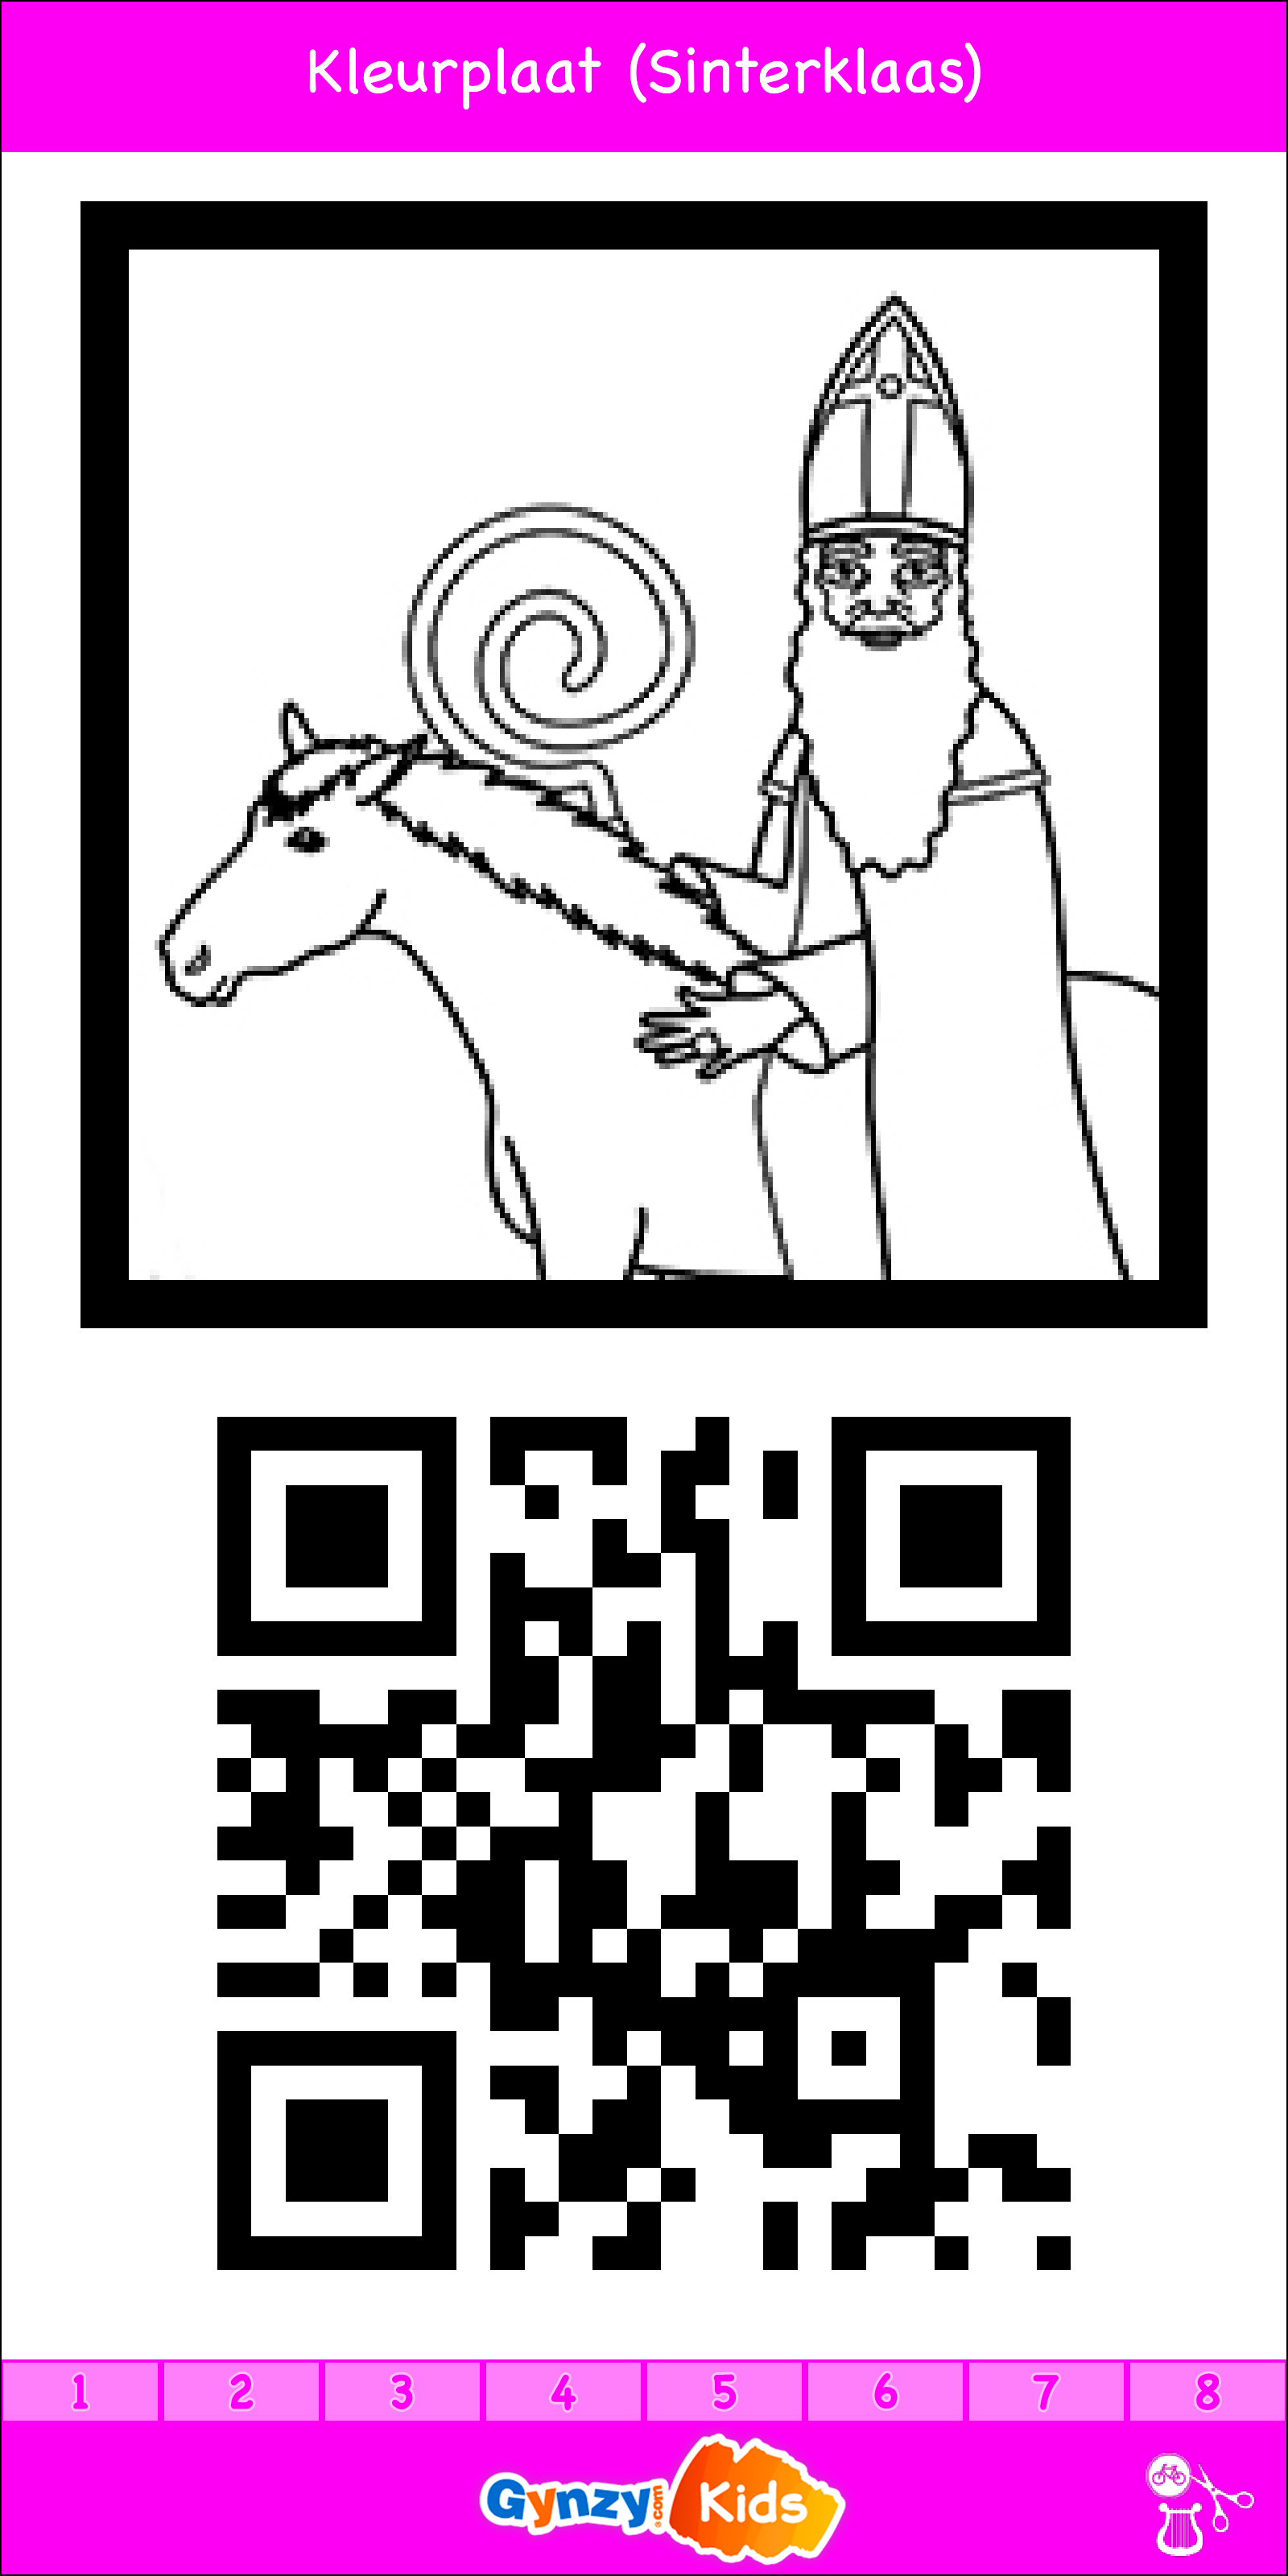 kleurplaten thema sinterklaas qr code oefening